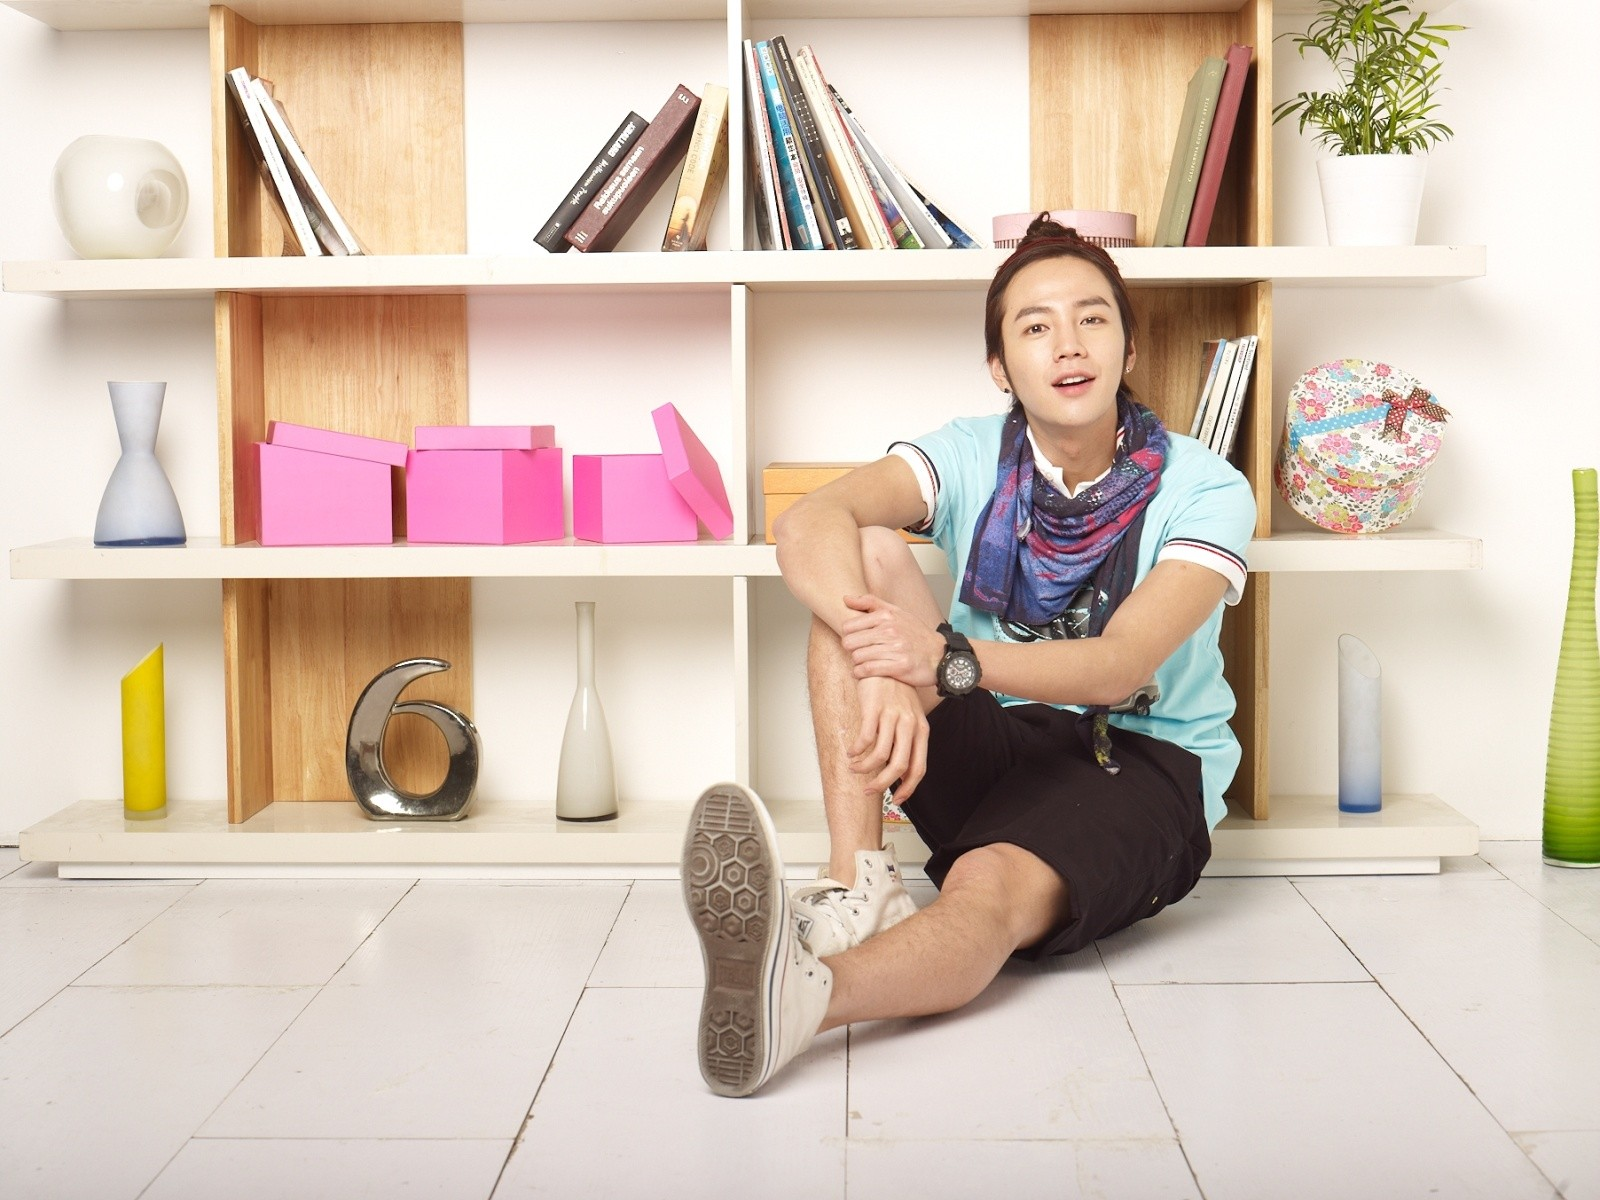 http://korean-cute.sosugary.com/albums/userpics/10001/qpk6.jpg